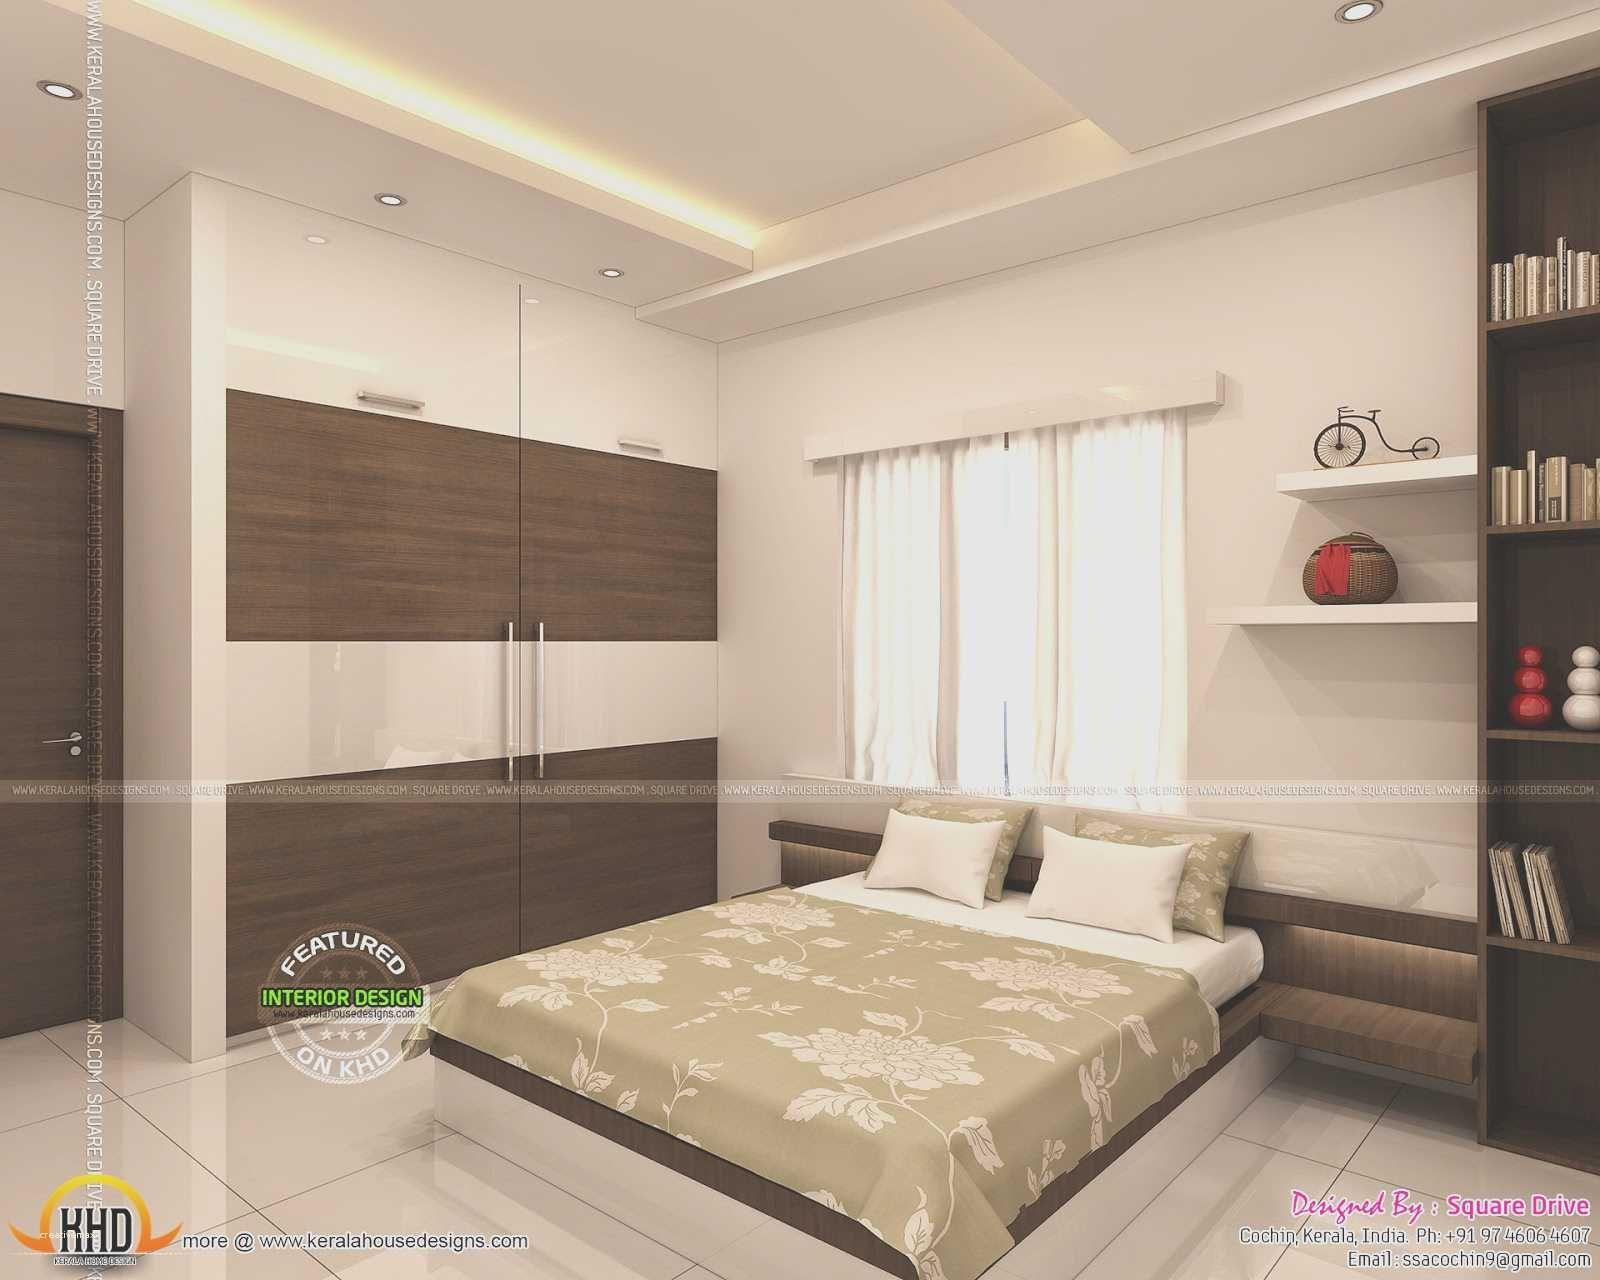 Interior Design Ideas For Bedroom Fascinating Awesome Elegant Bedroom Design Ideas  Elegant Bedroom Design Inspiration